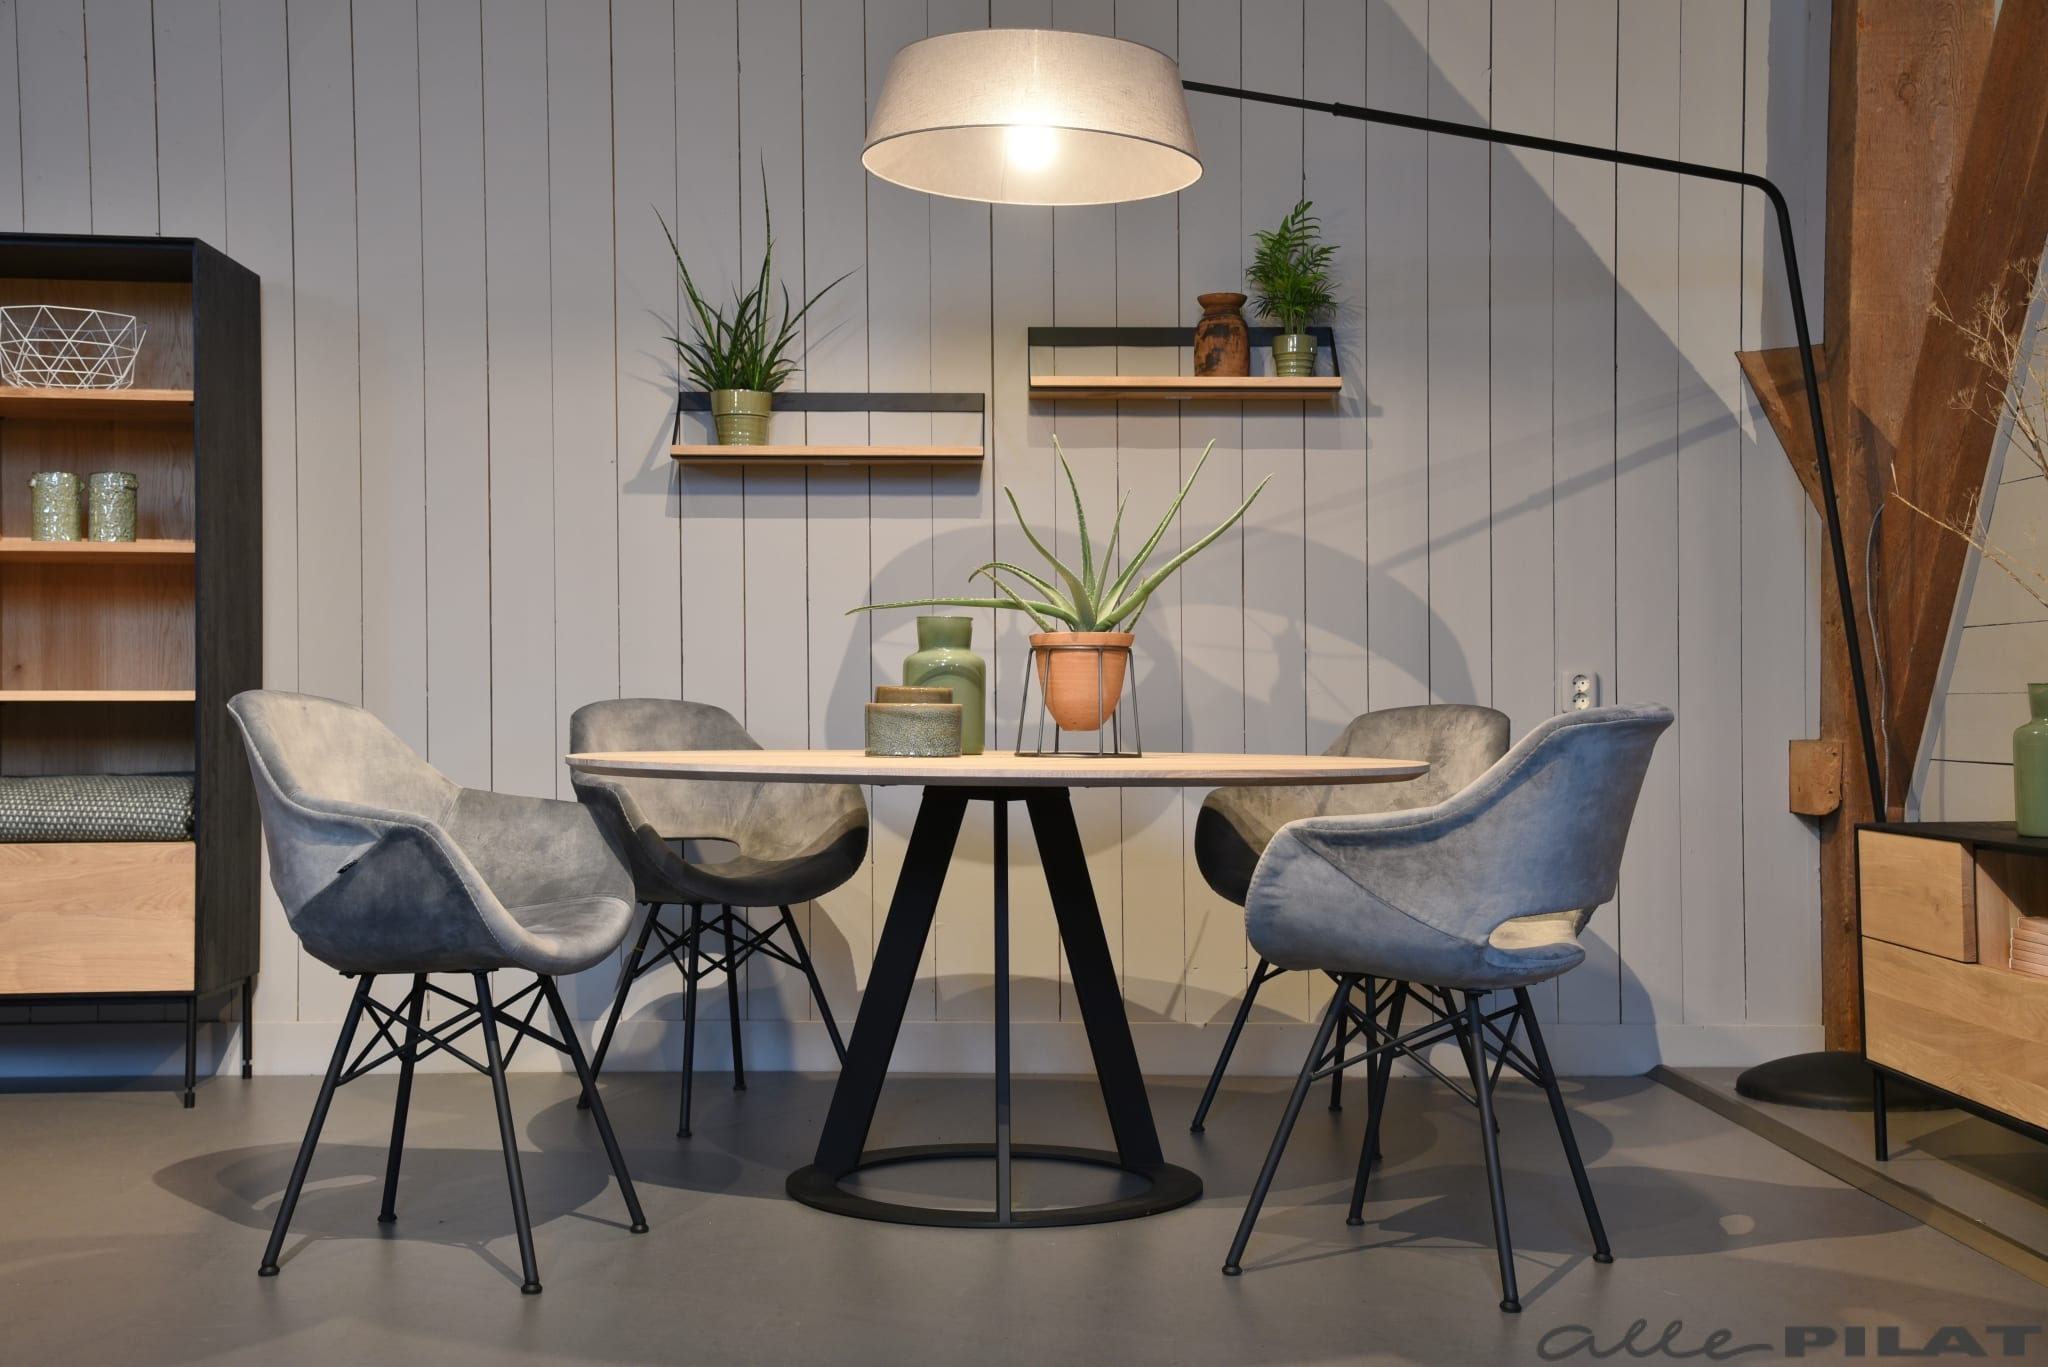 Zwarte Ronde Tafel : Ronde eiken tafel fier met zwart frame woonwinkel alle pilat